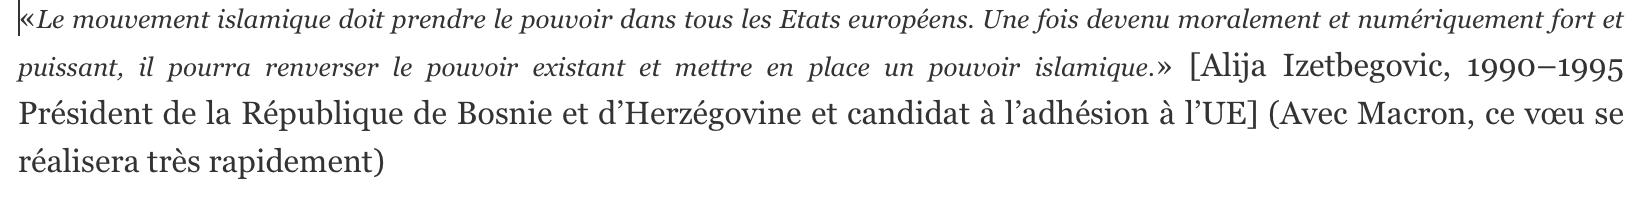 UOIF : Macron ne peut pas ignorer qui sont Nadeem Elyas, Sayyd Qotb,Hassan al-Banna…